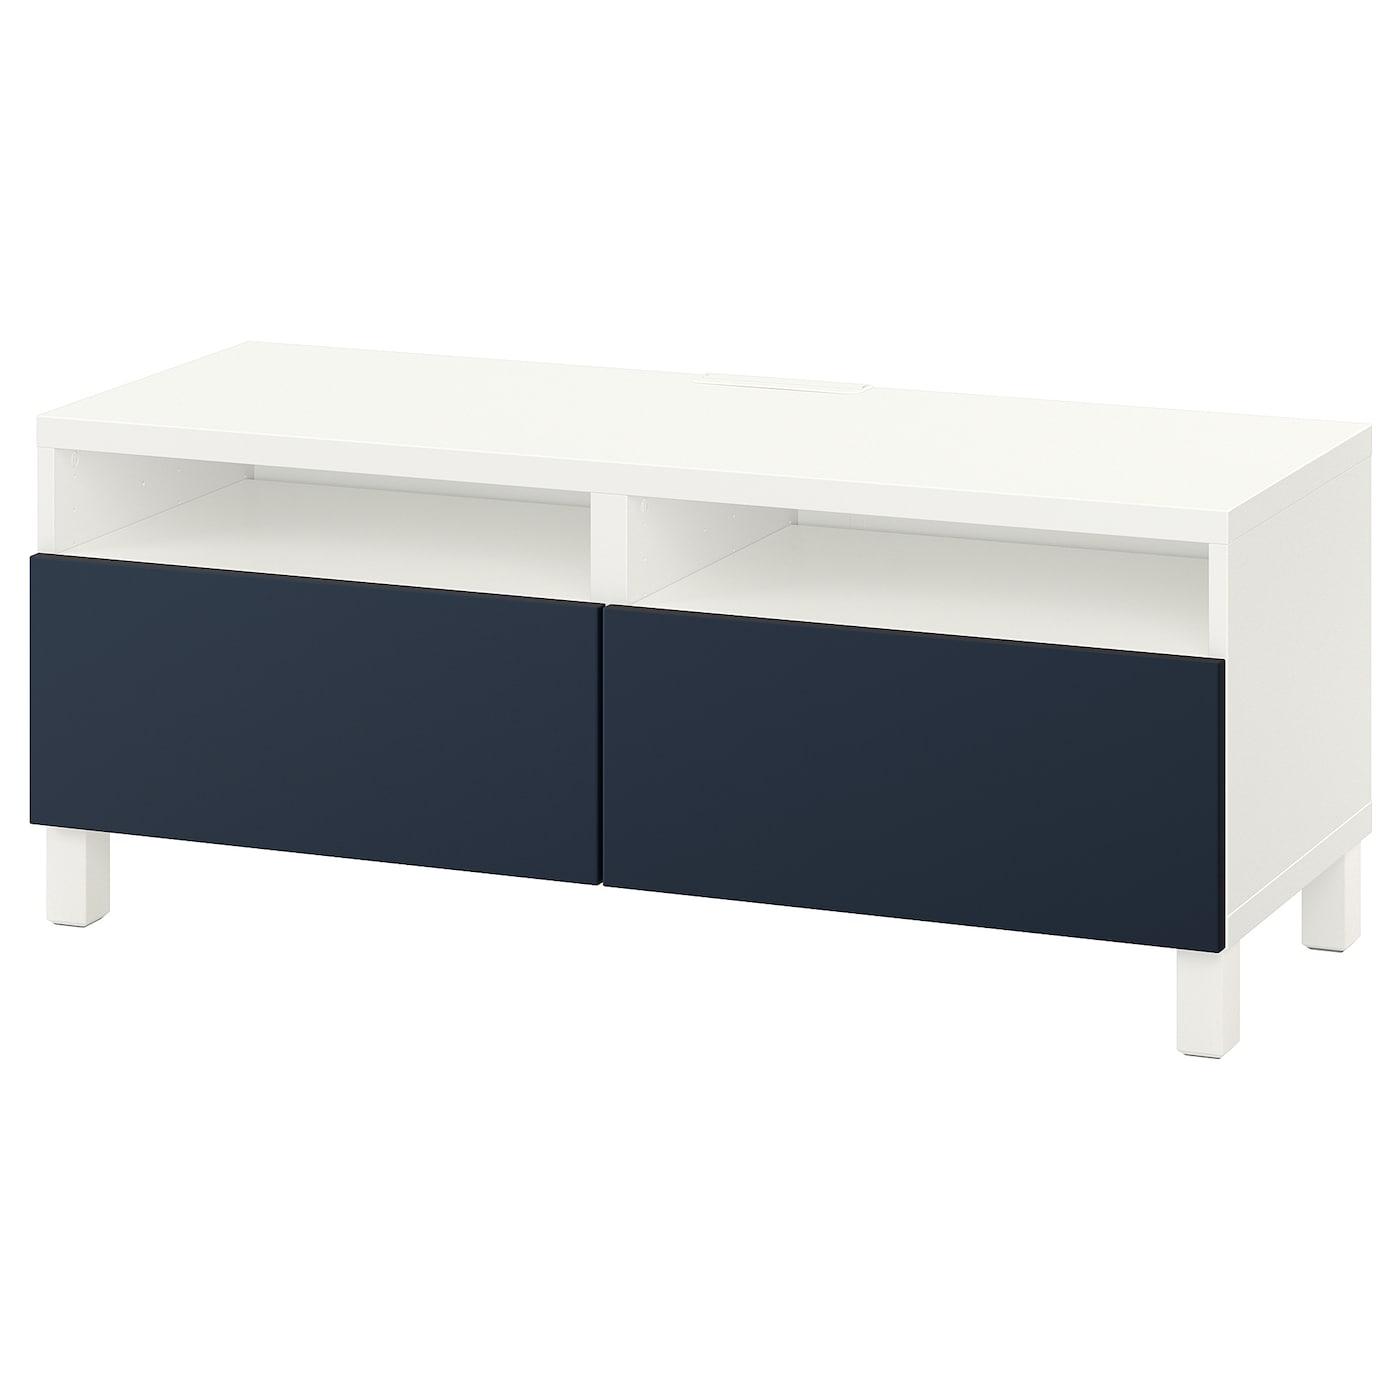 Best 197 Tv Bench With Drawers White Notviken Stubbarp